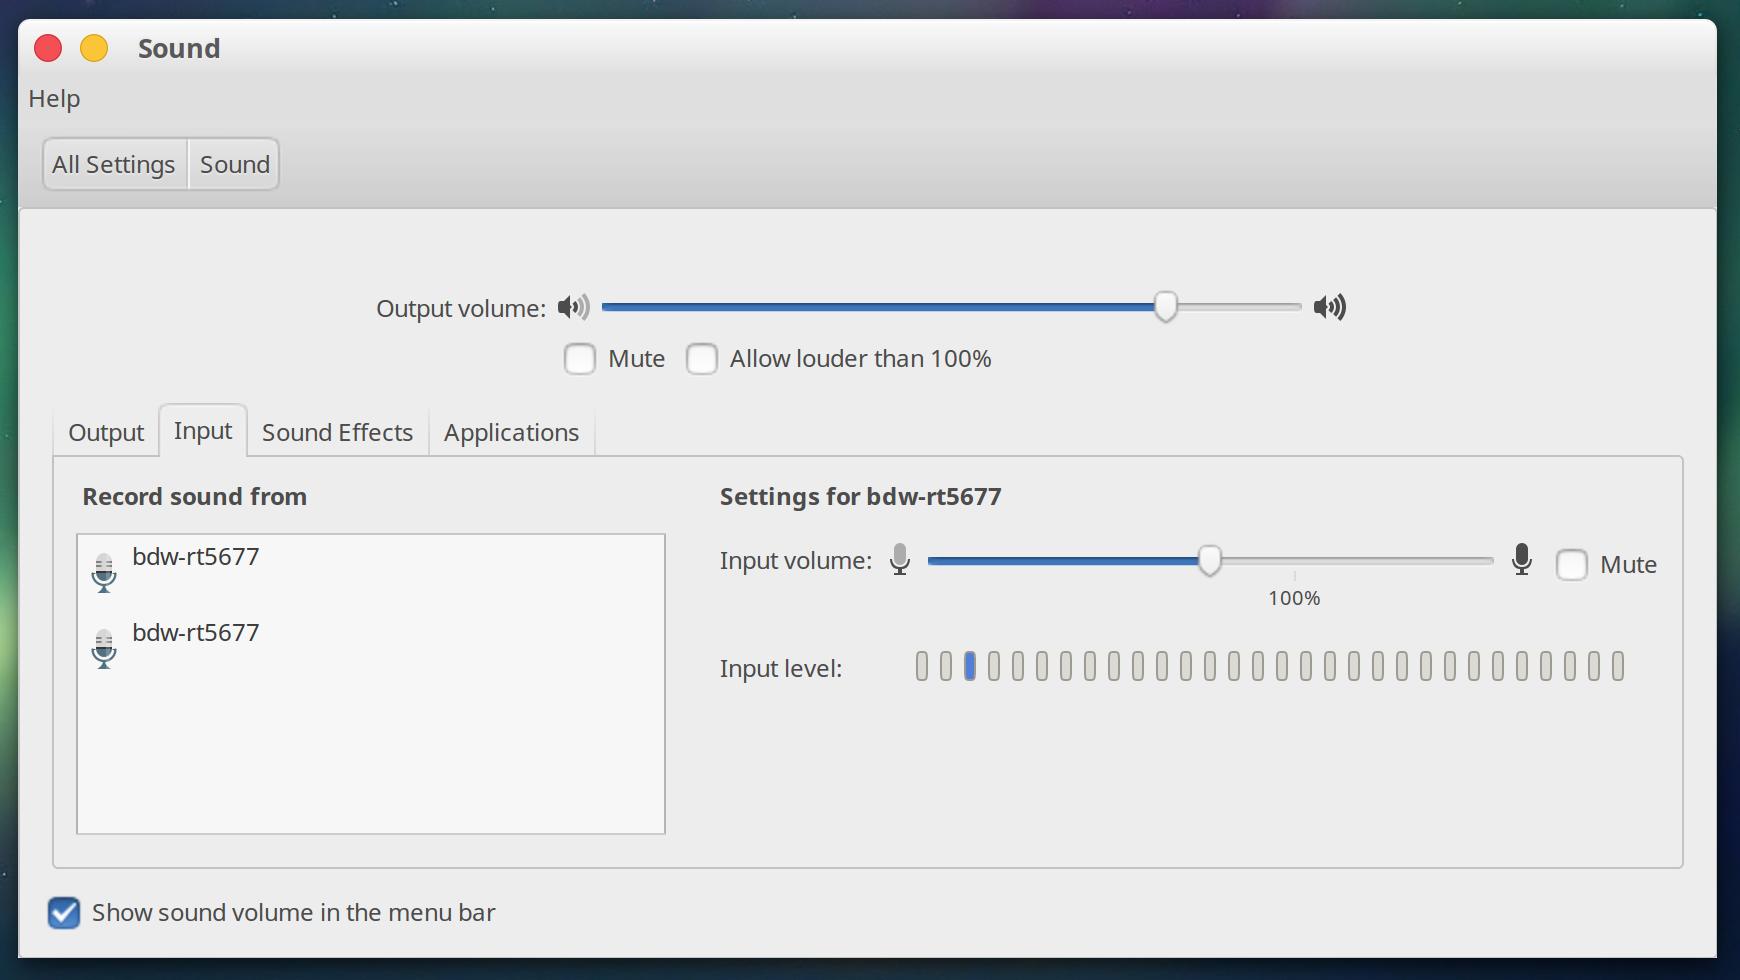 Ubuntu Sound settings showing bdw-rt5677 device as microphone input